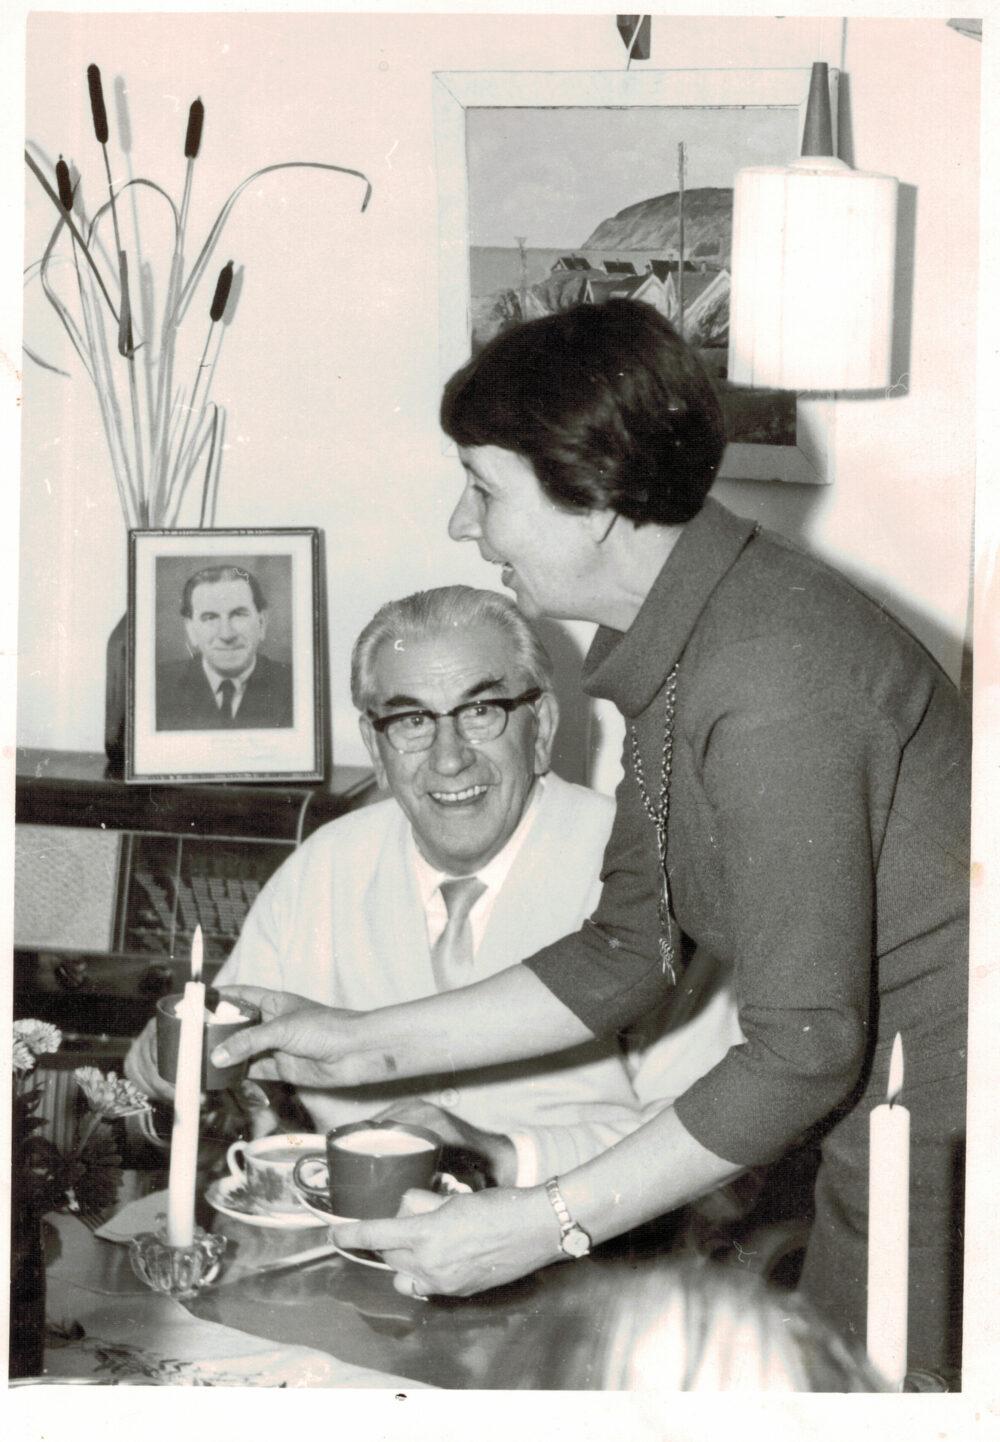 Martinus and Sigbritt Therner